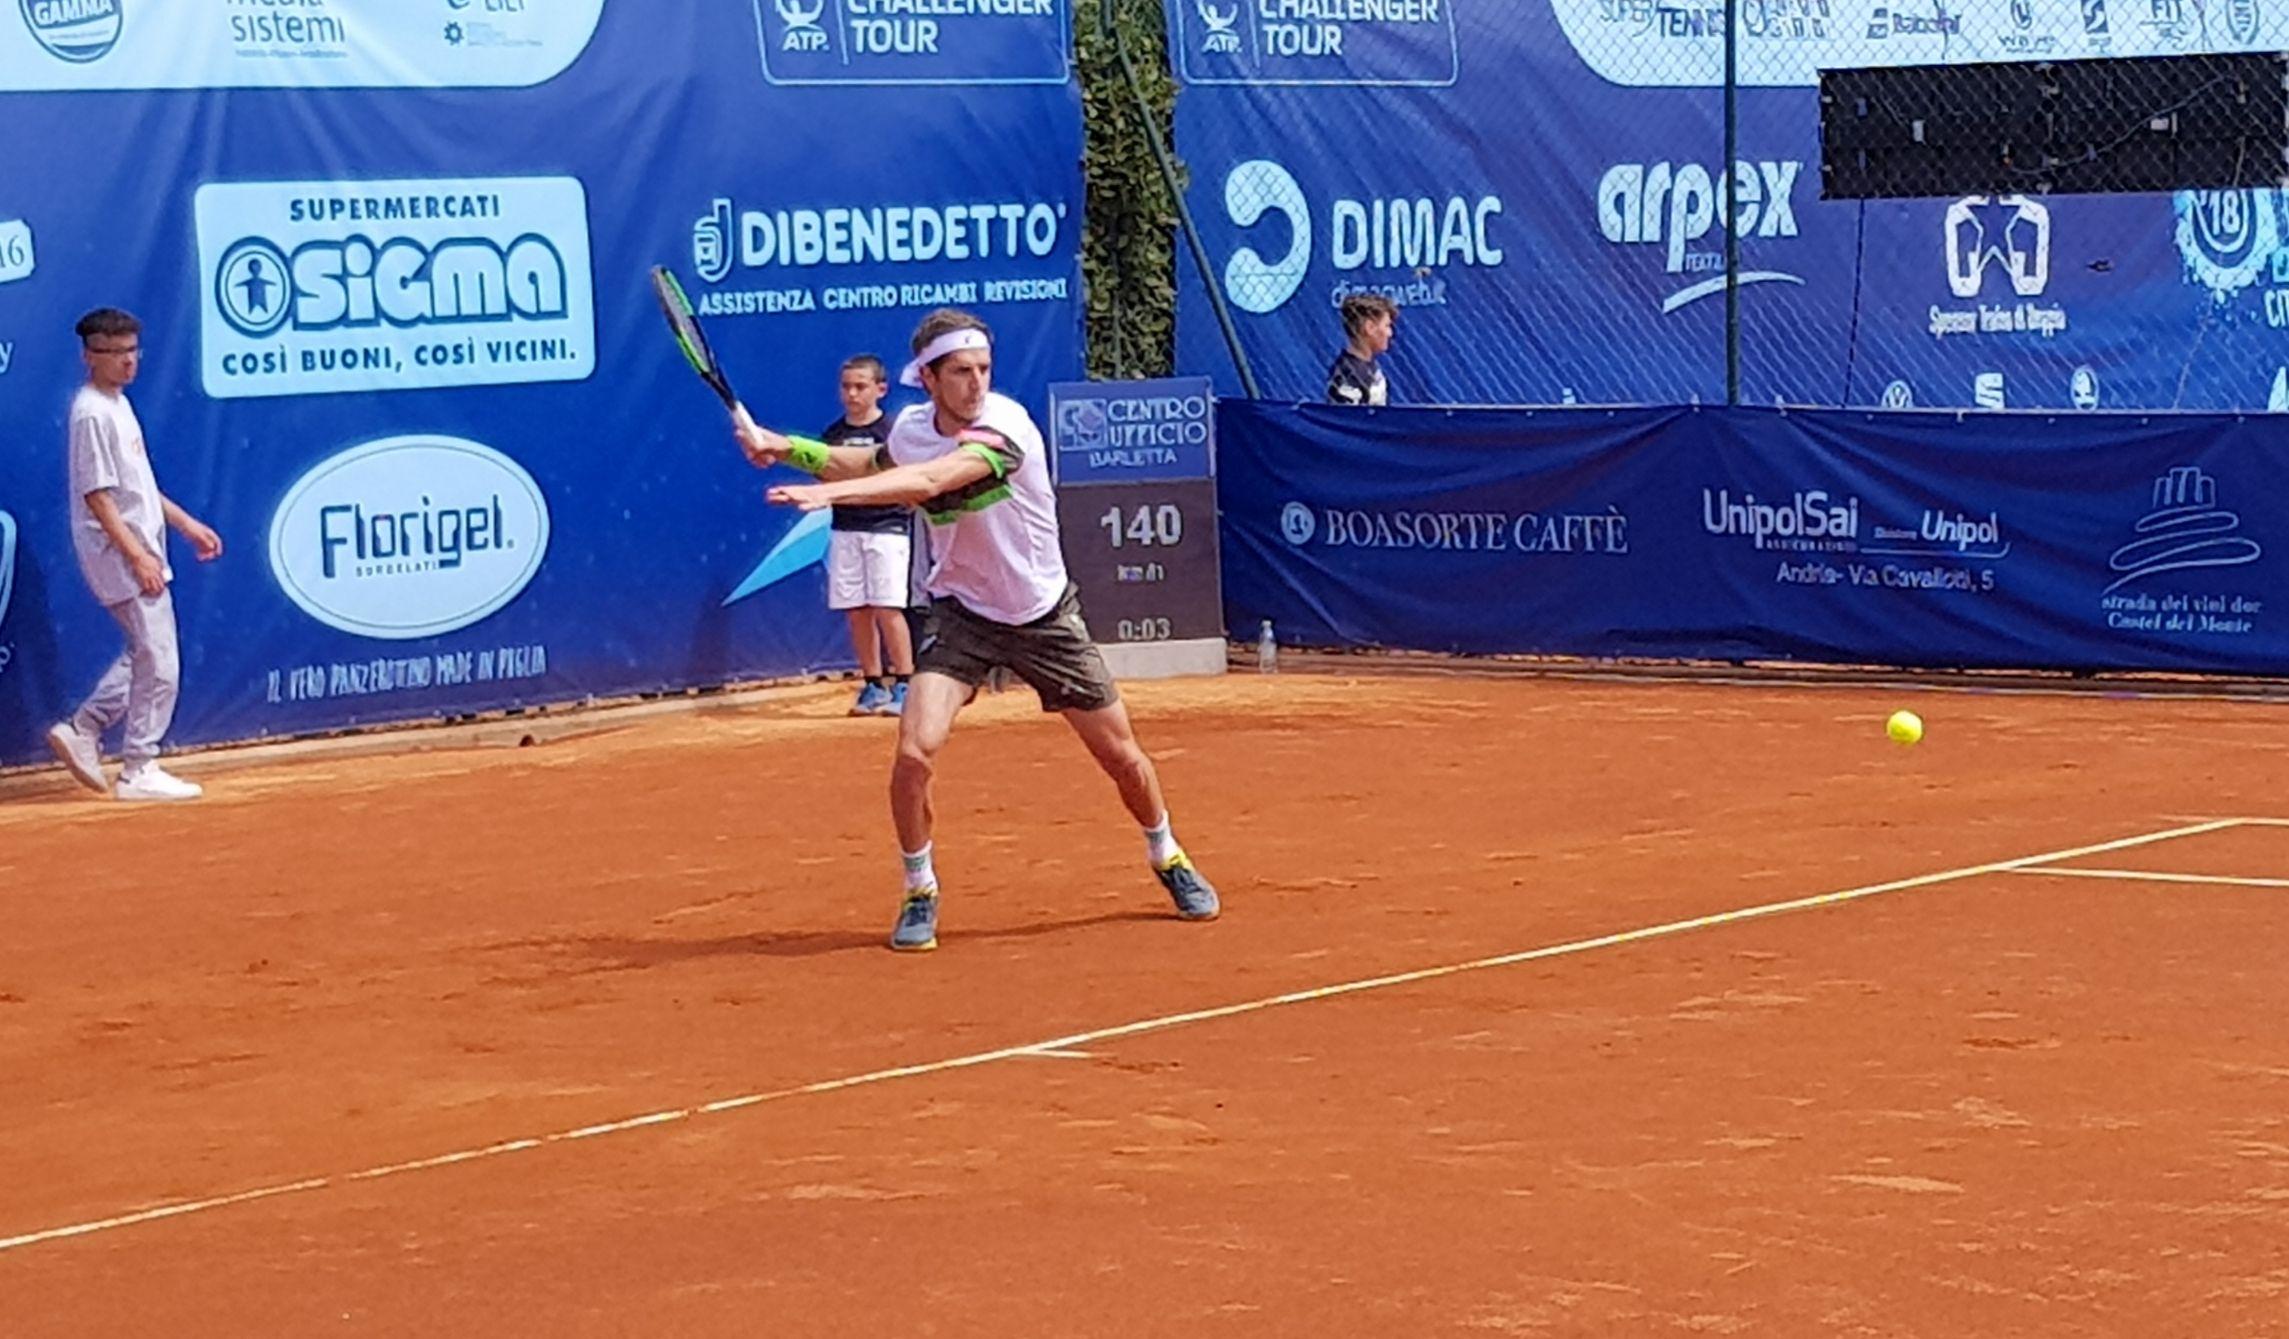 Matteo Donati classe 1995